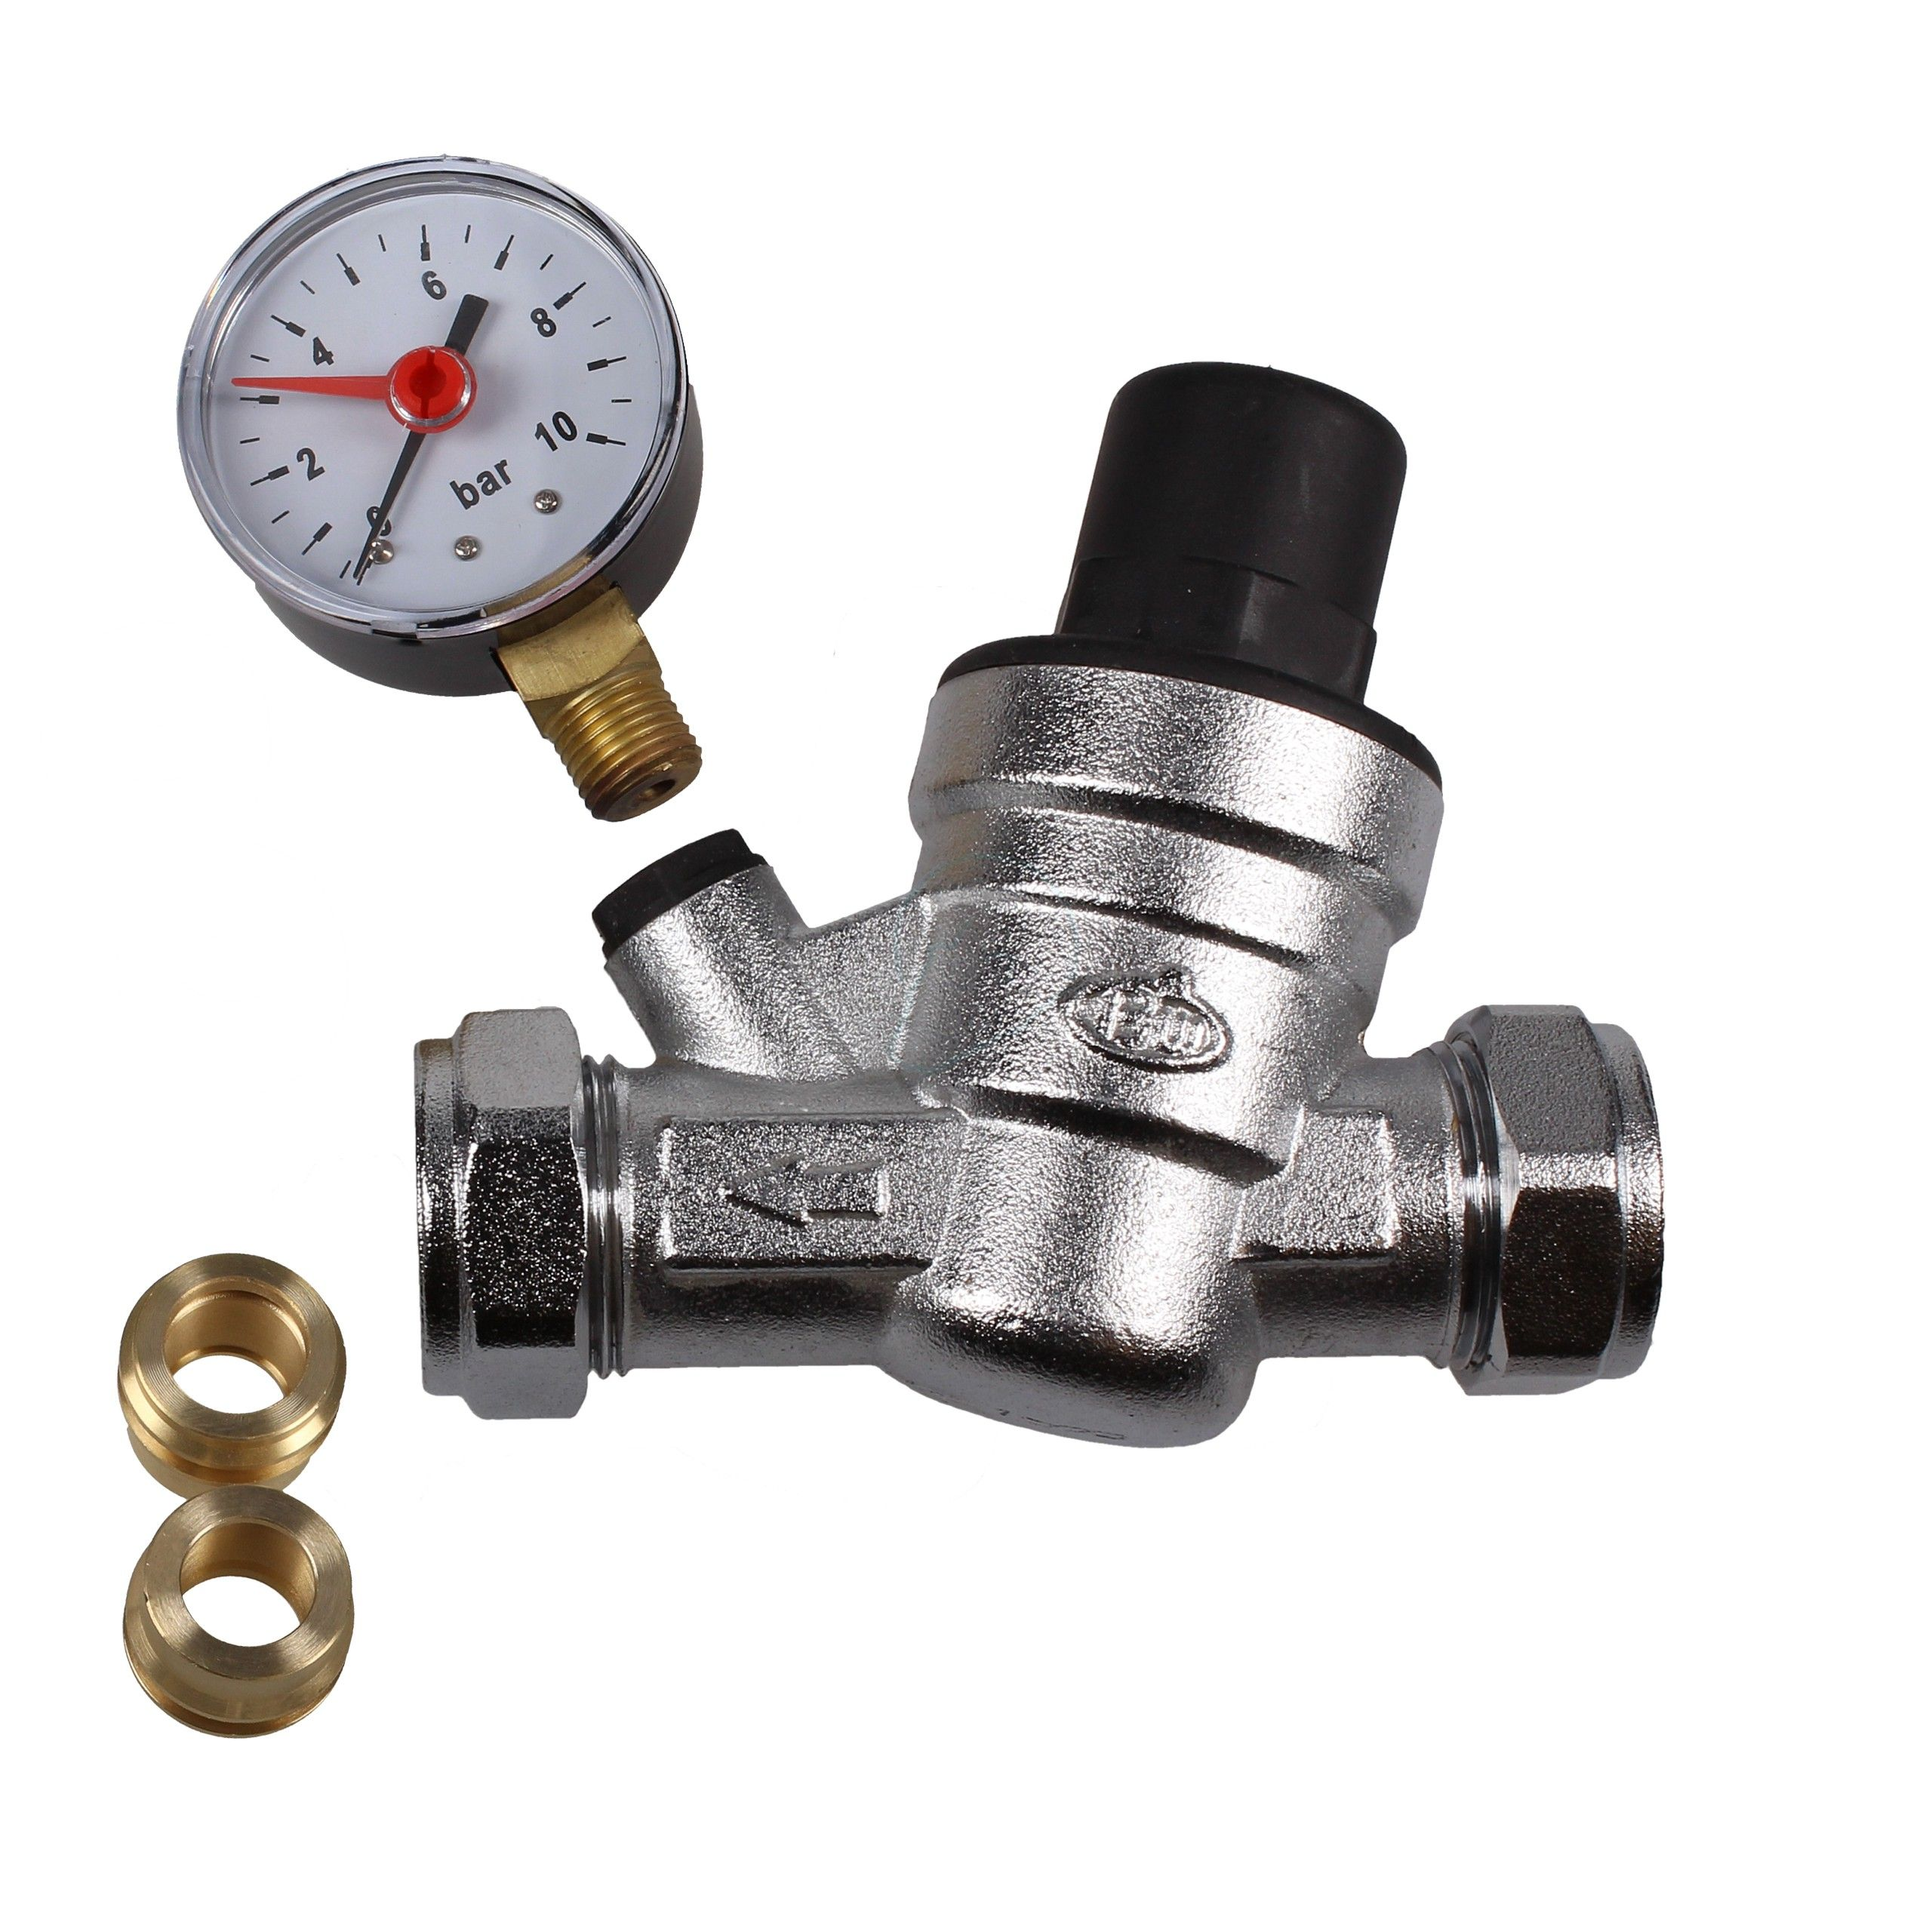 Pressure Reducing Valve Hot water, Valve